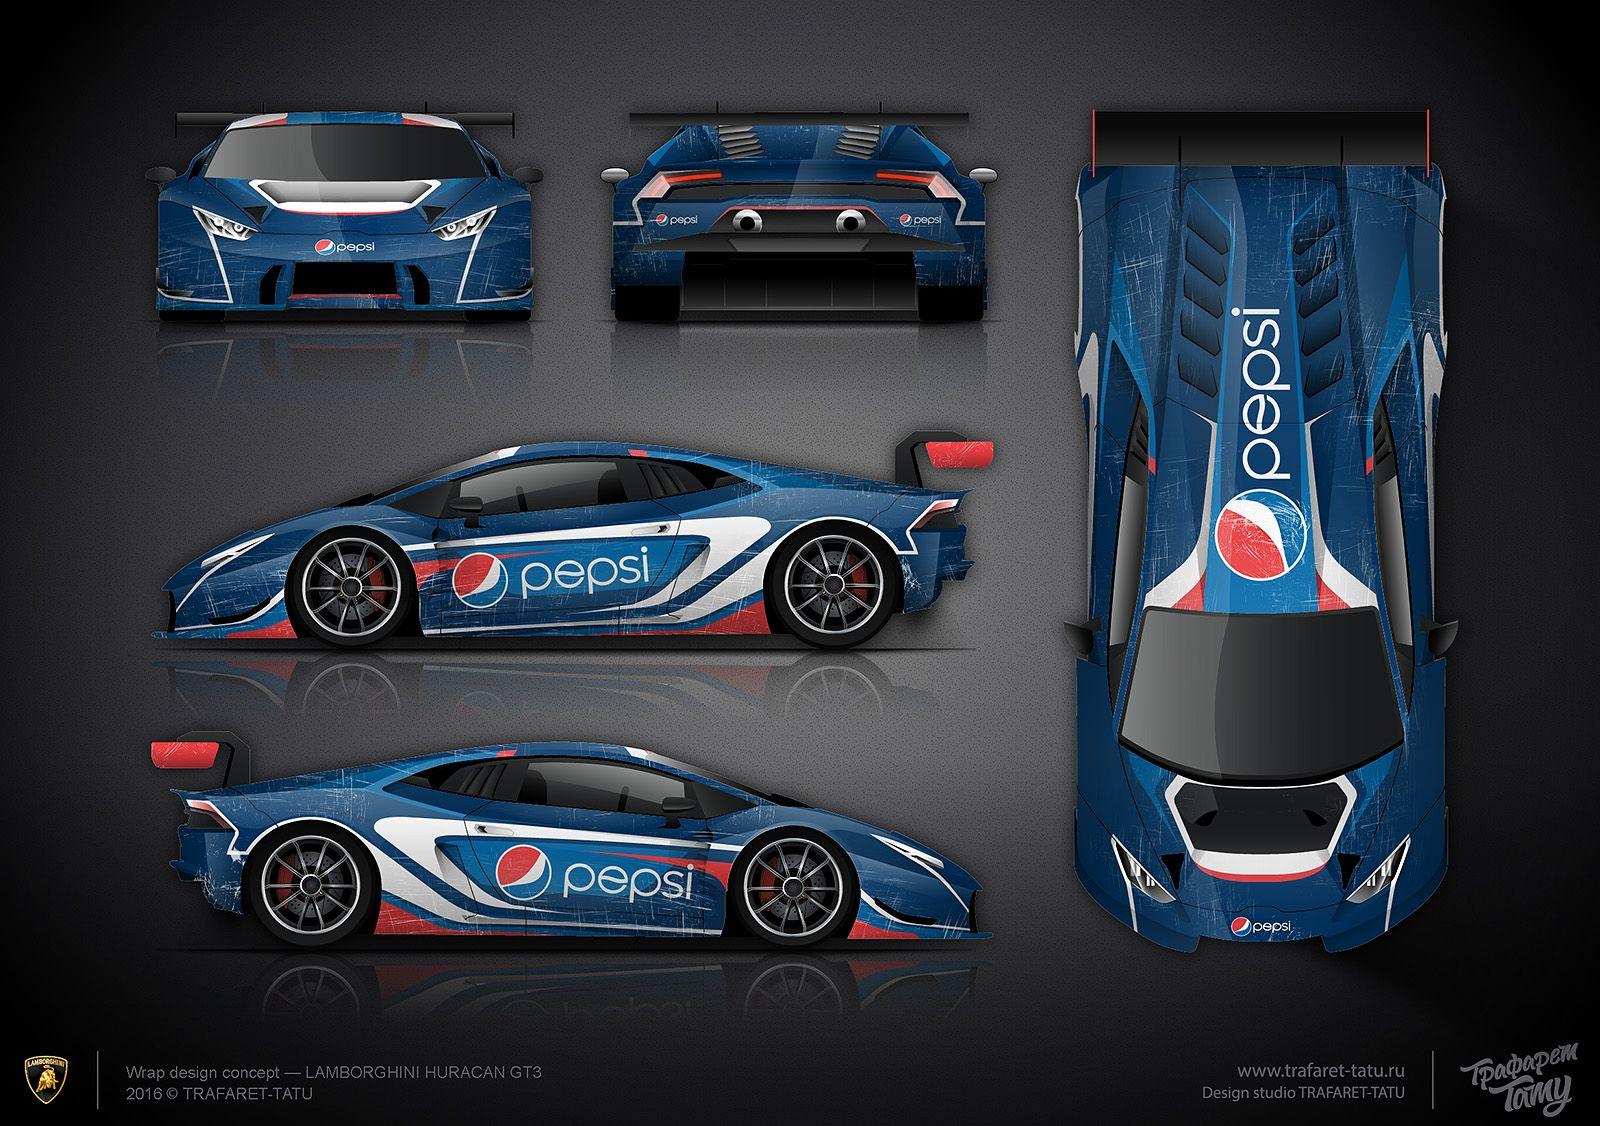 Wrap Design Concept #5 Pepsi Artcar LAMBORGHINI HURACAN GT3